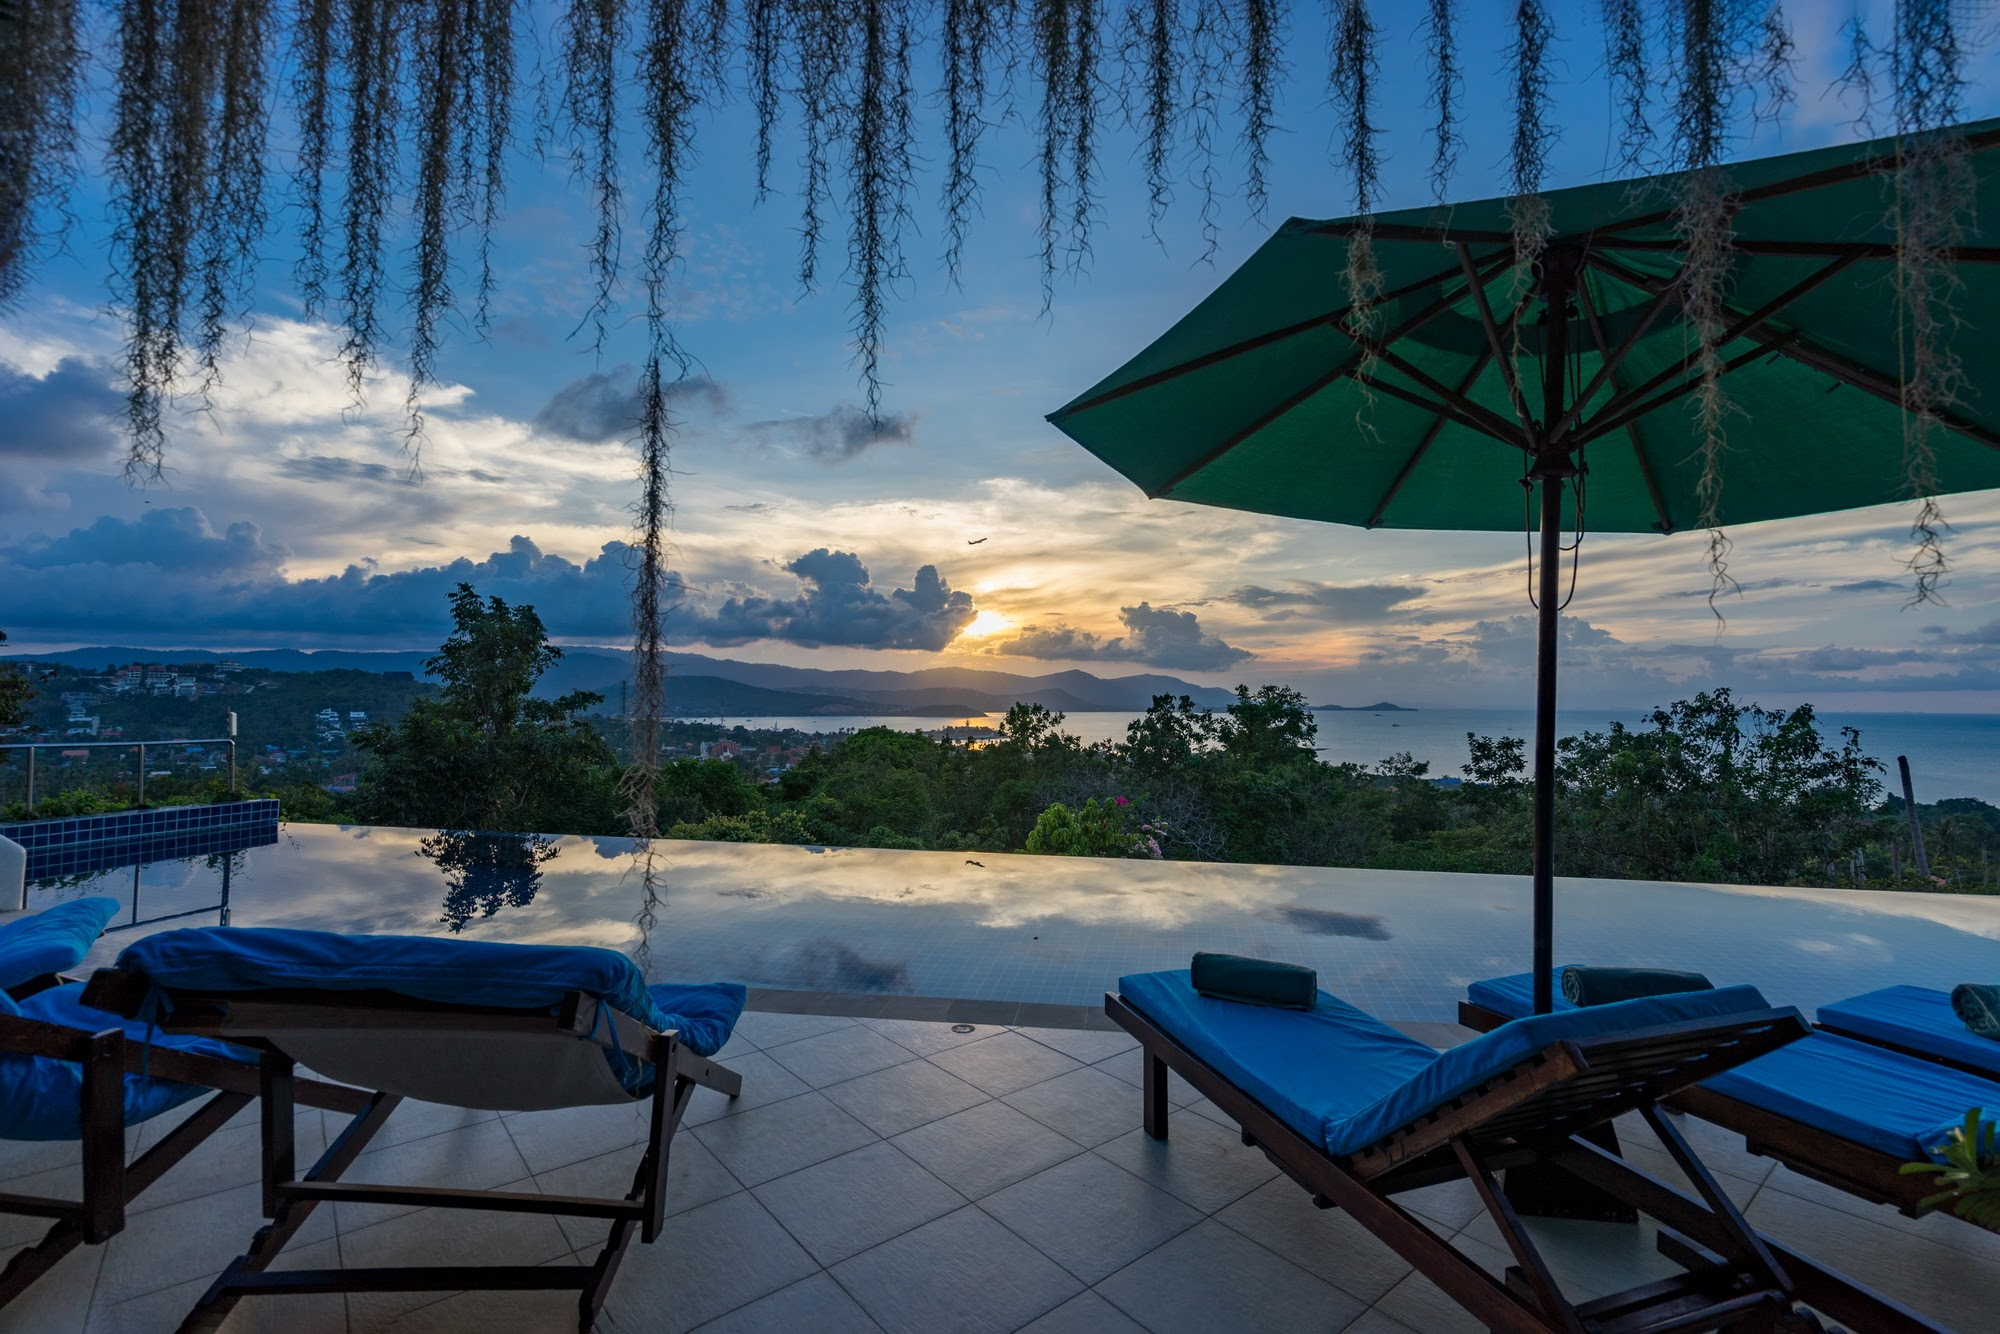 Koh+Samui+Vacation+Villa+Pool+Sea+View+(21).jpg